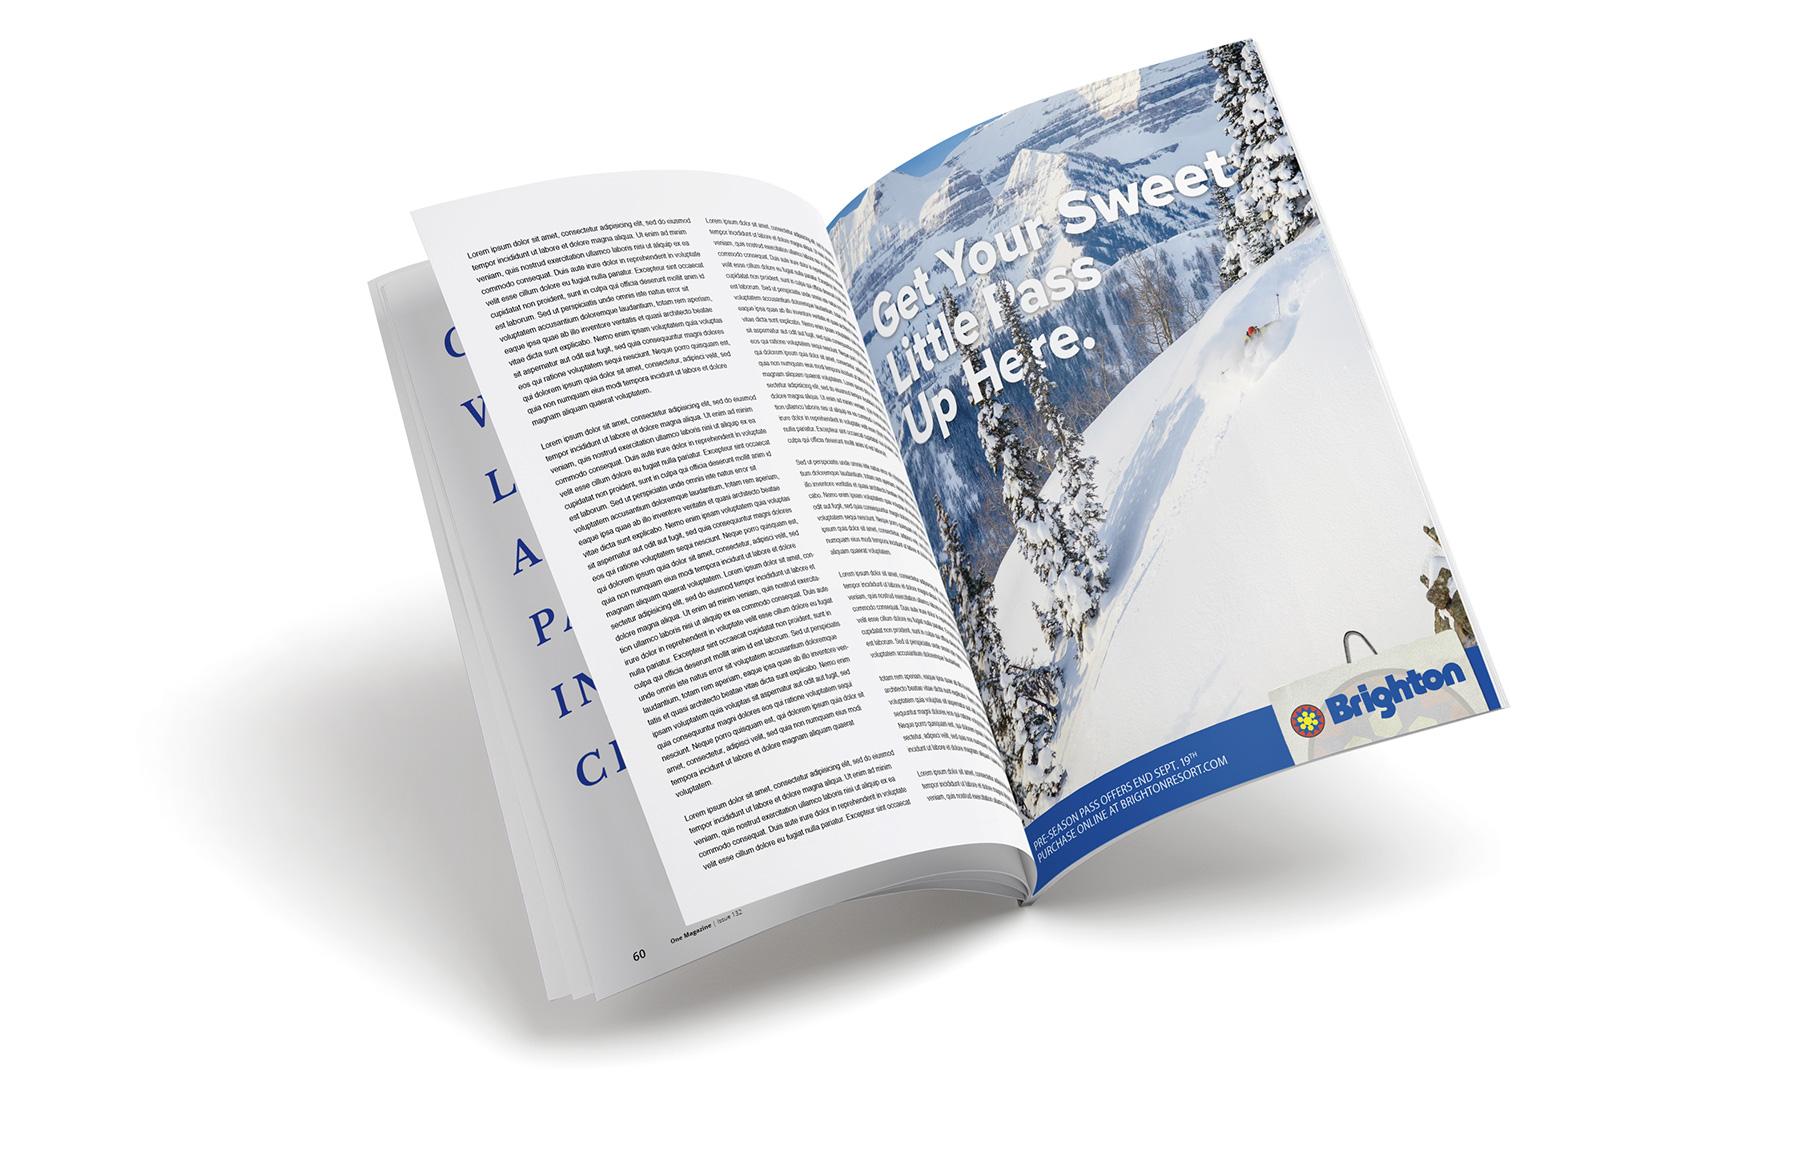 Brighton Ski Resort full page advertisment in magazine